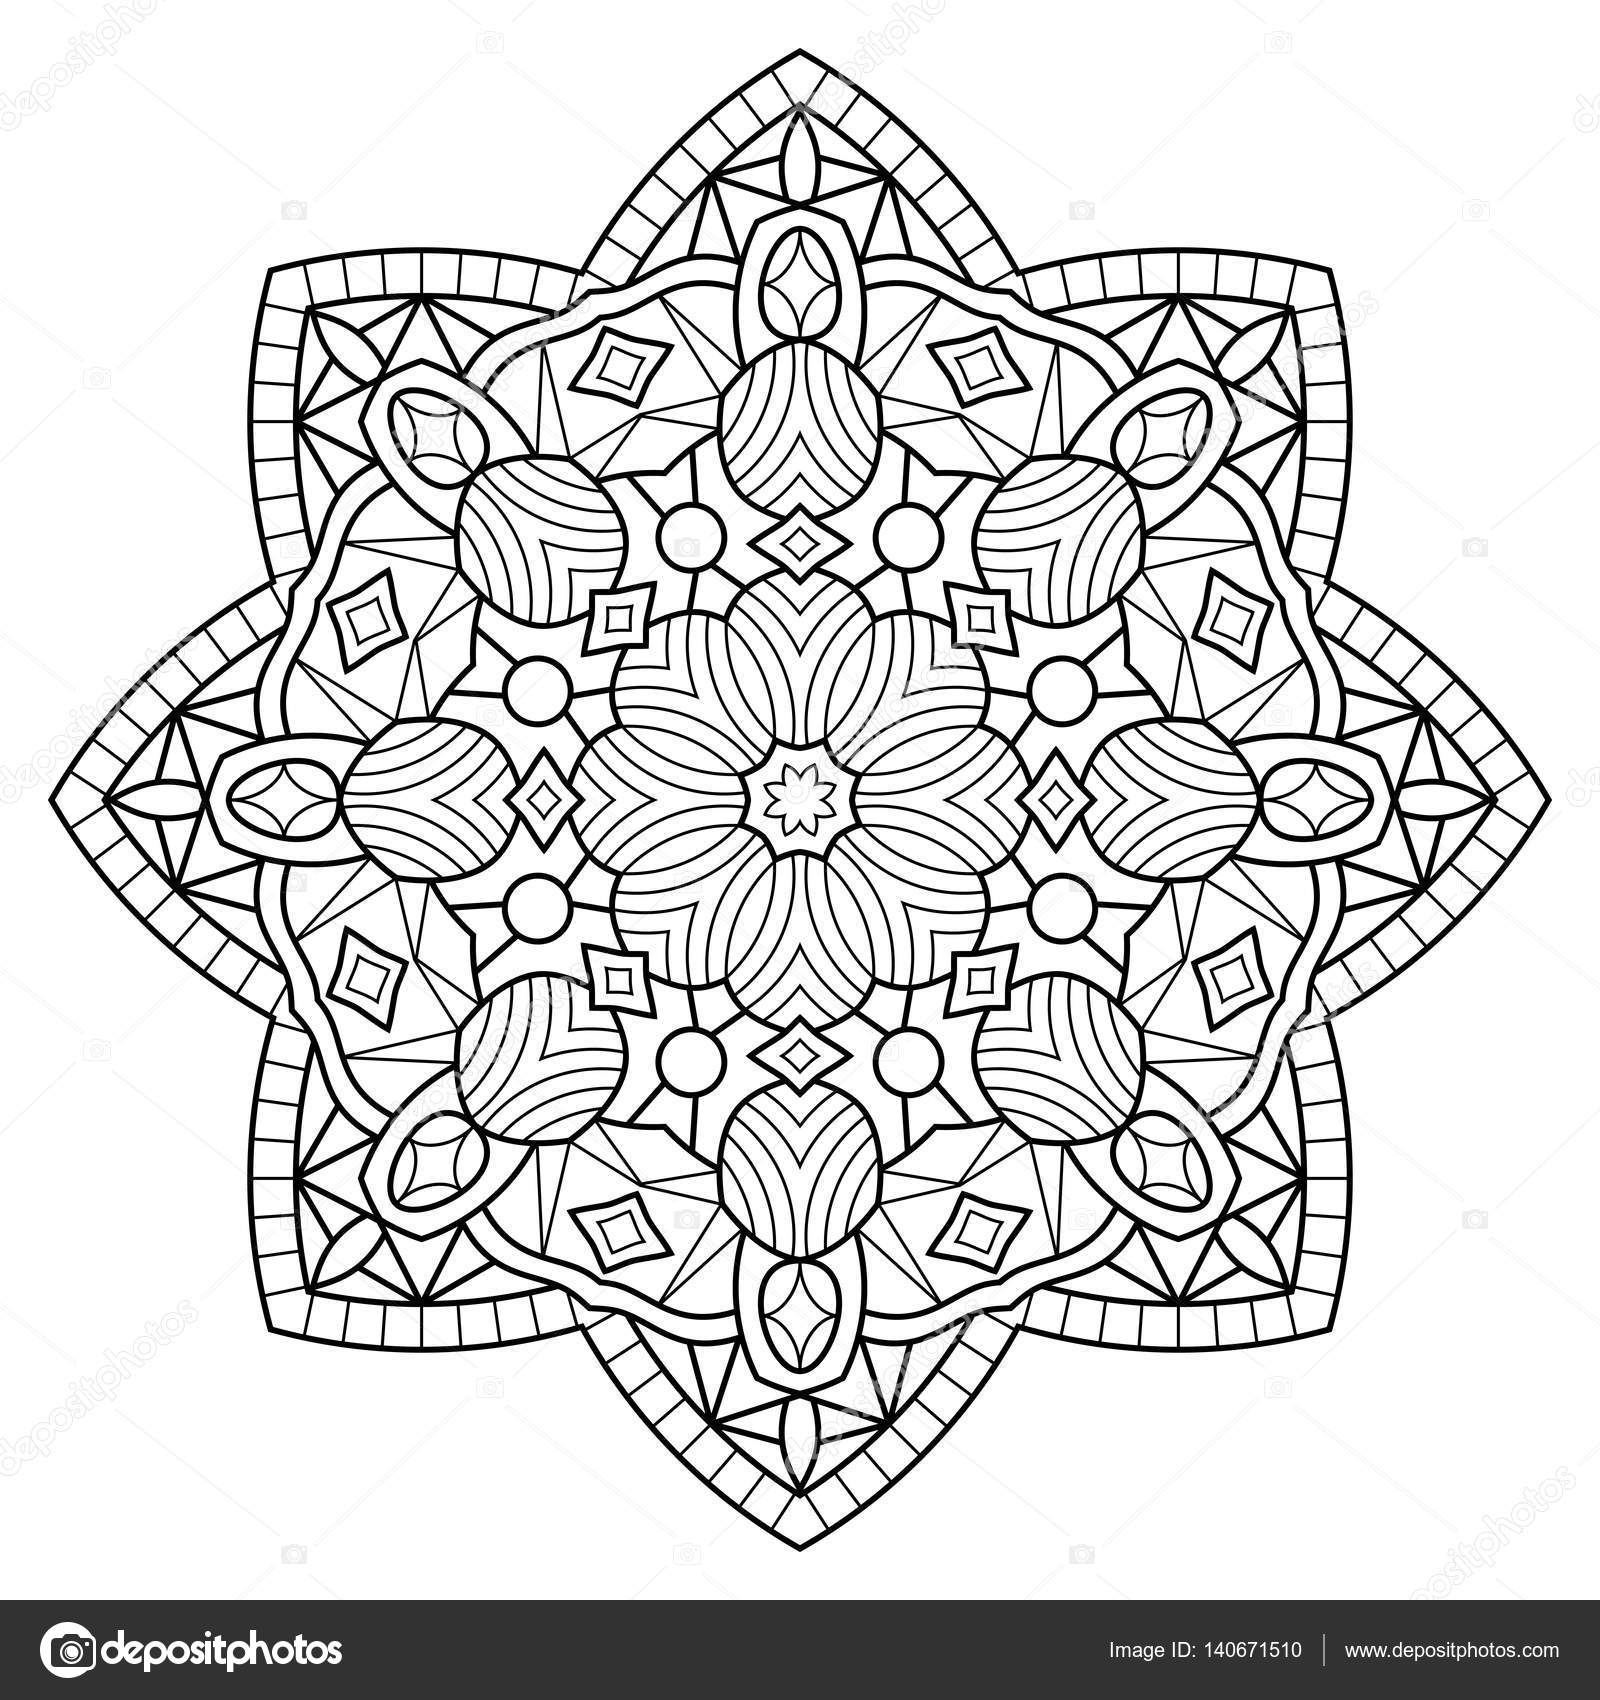 Mandala. Malvorlagen Buch — Stockvektor © jelisua88 #140671510